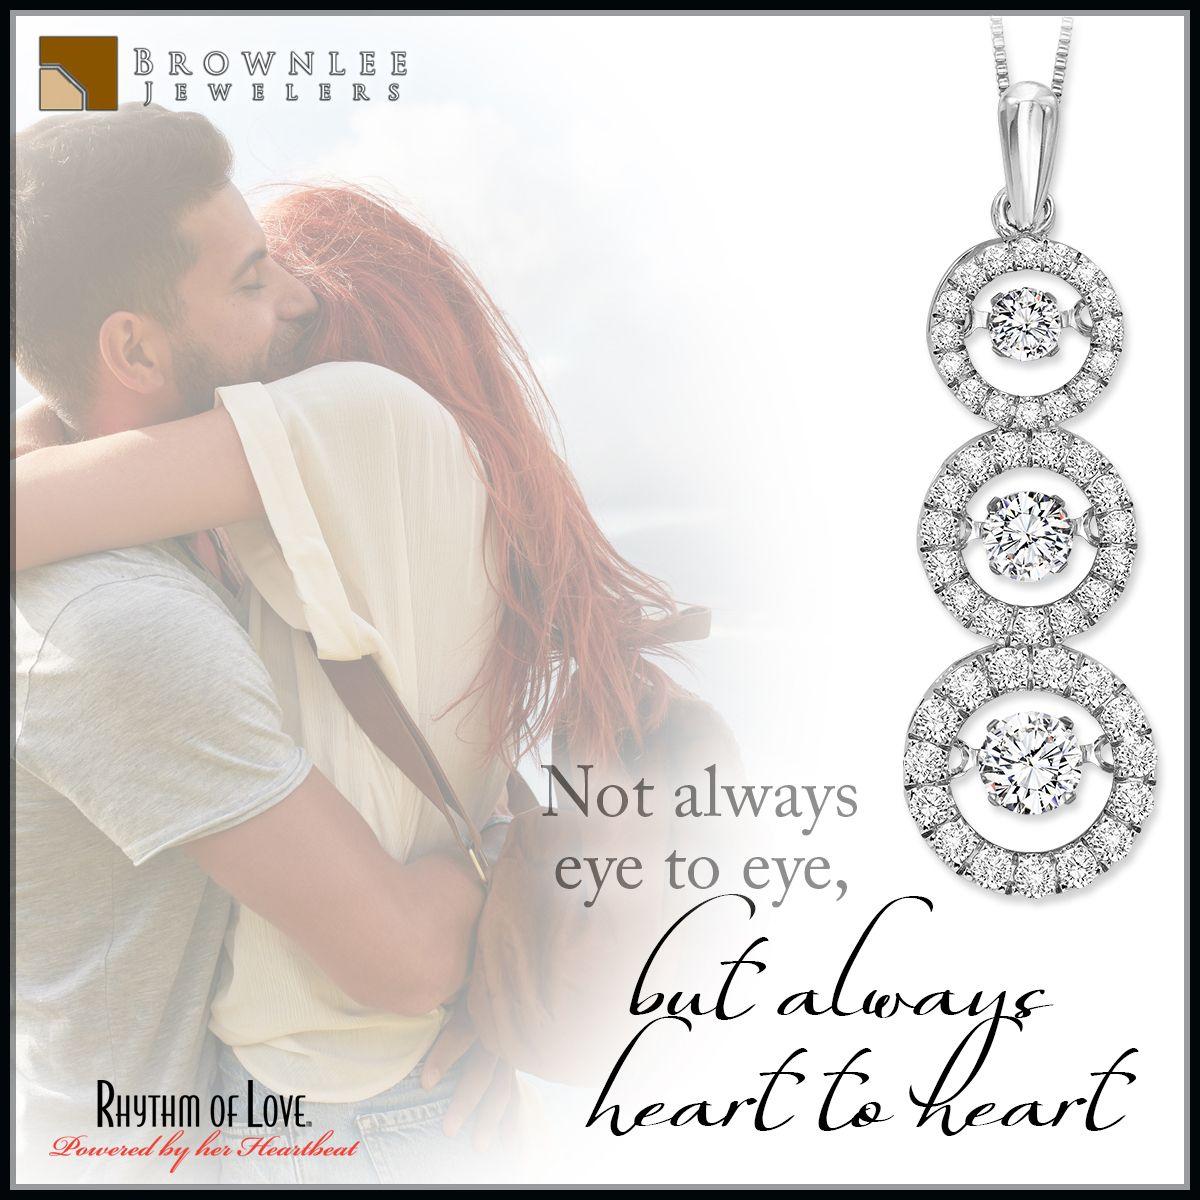 Two #hearts equal a lifetime of #Love  #Diamonds #VibratingDiamonds